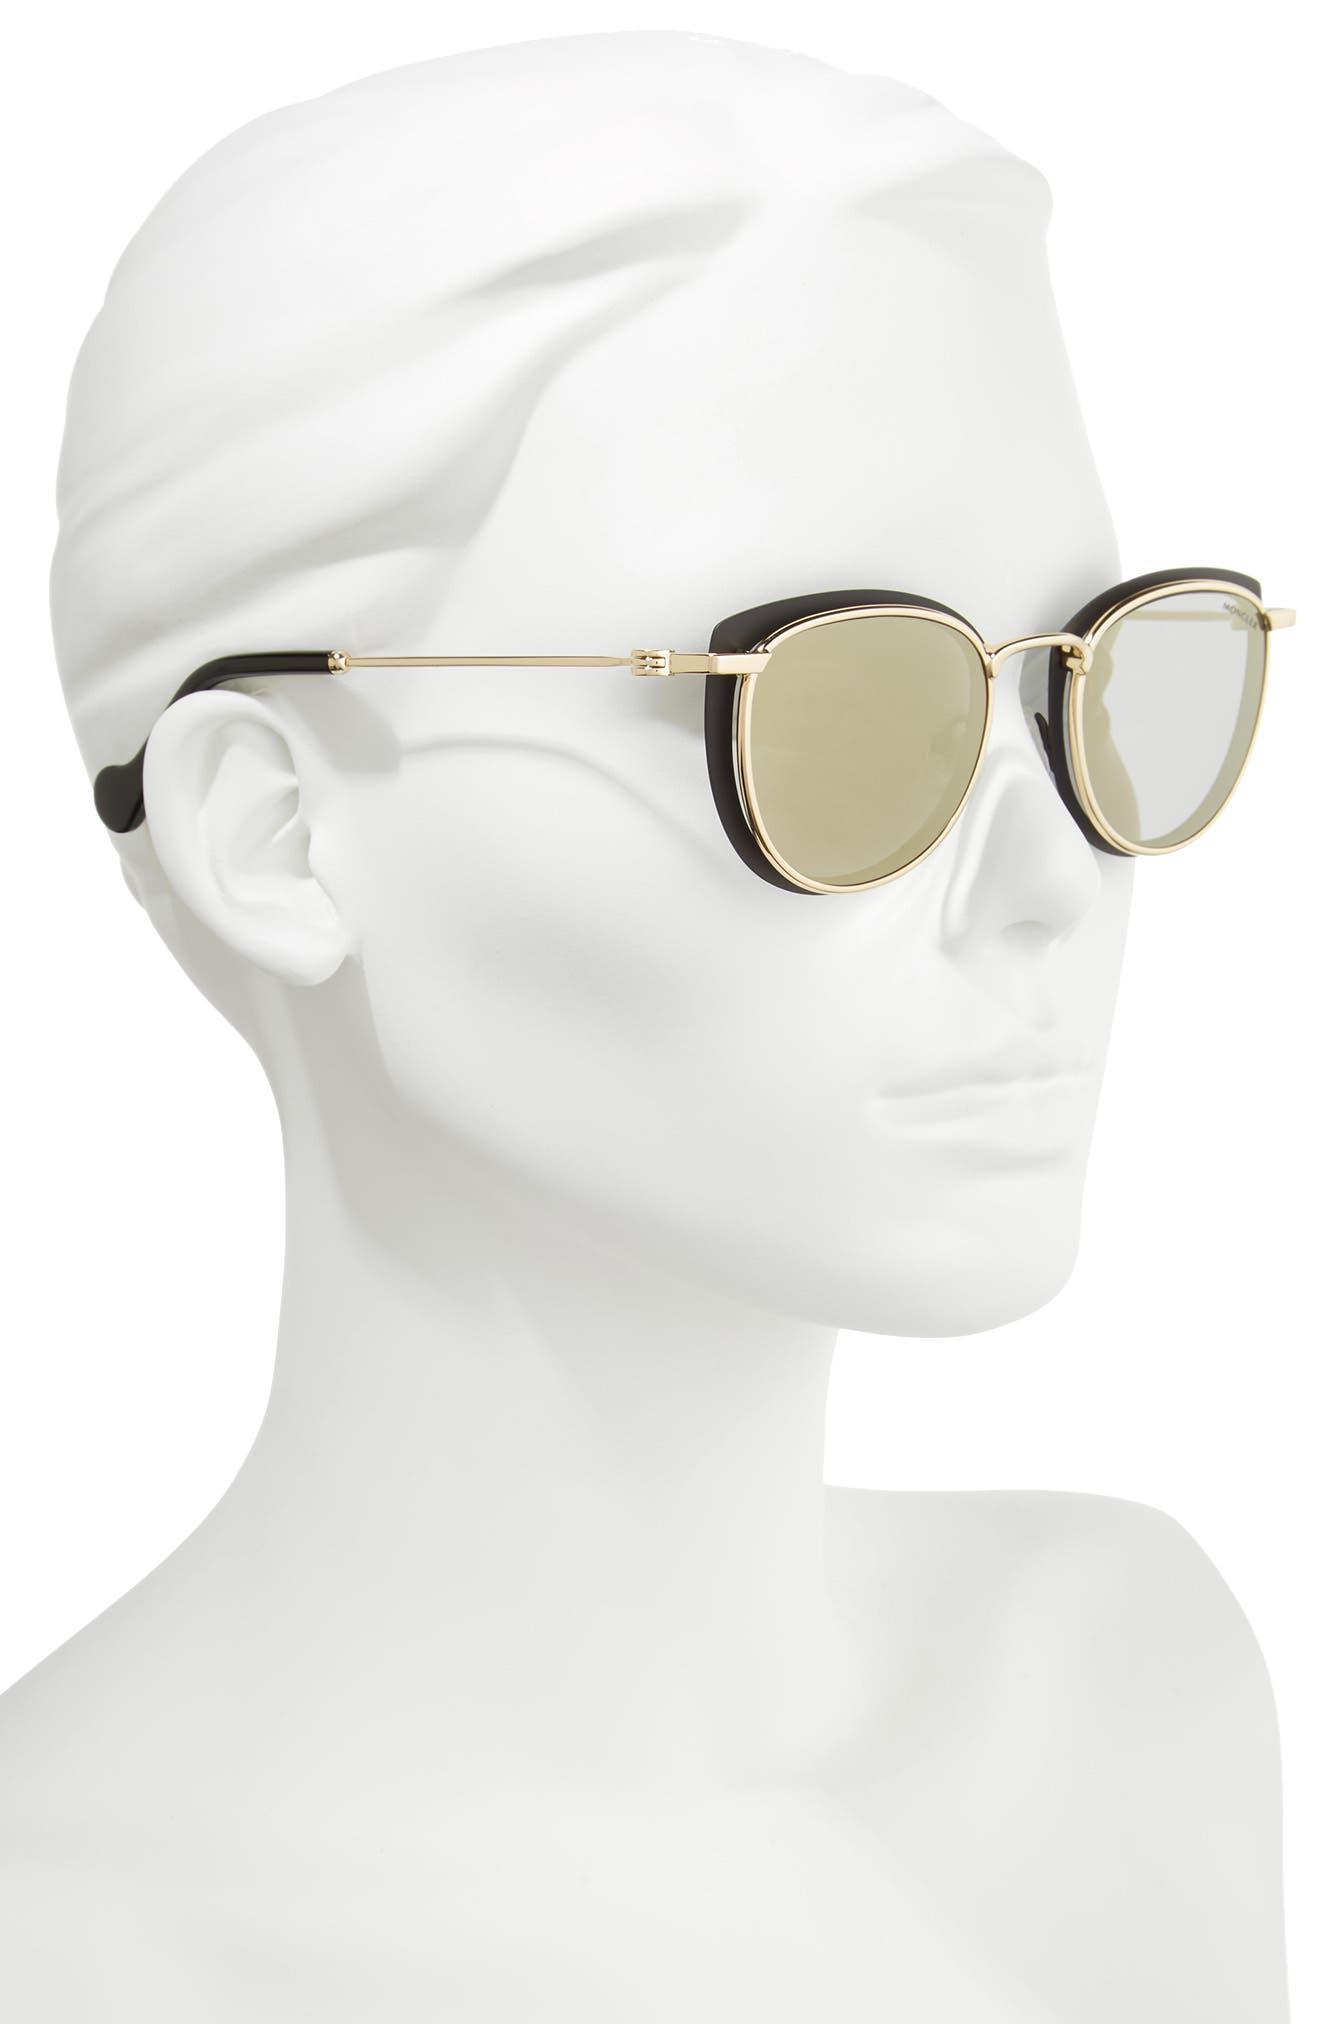 50mm Mirrored Geometric Sunglasses,                             Alternate thumbnail 2, color,                             Black/ Pale Gold/ Smoke/ Gold